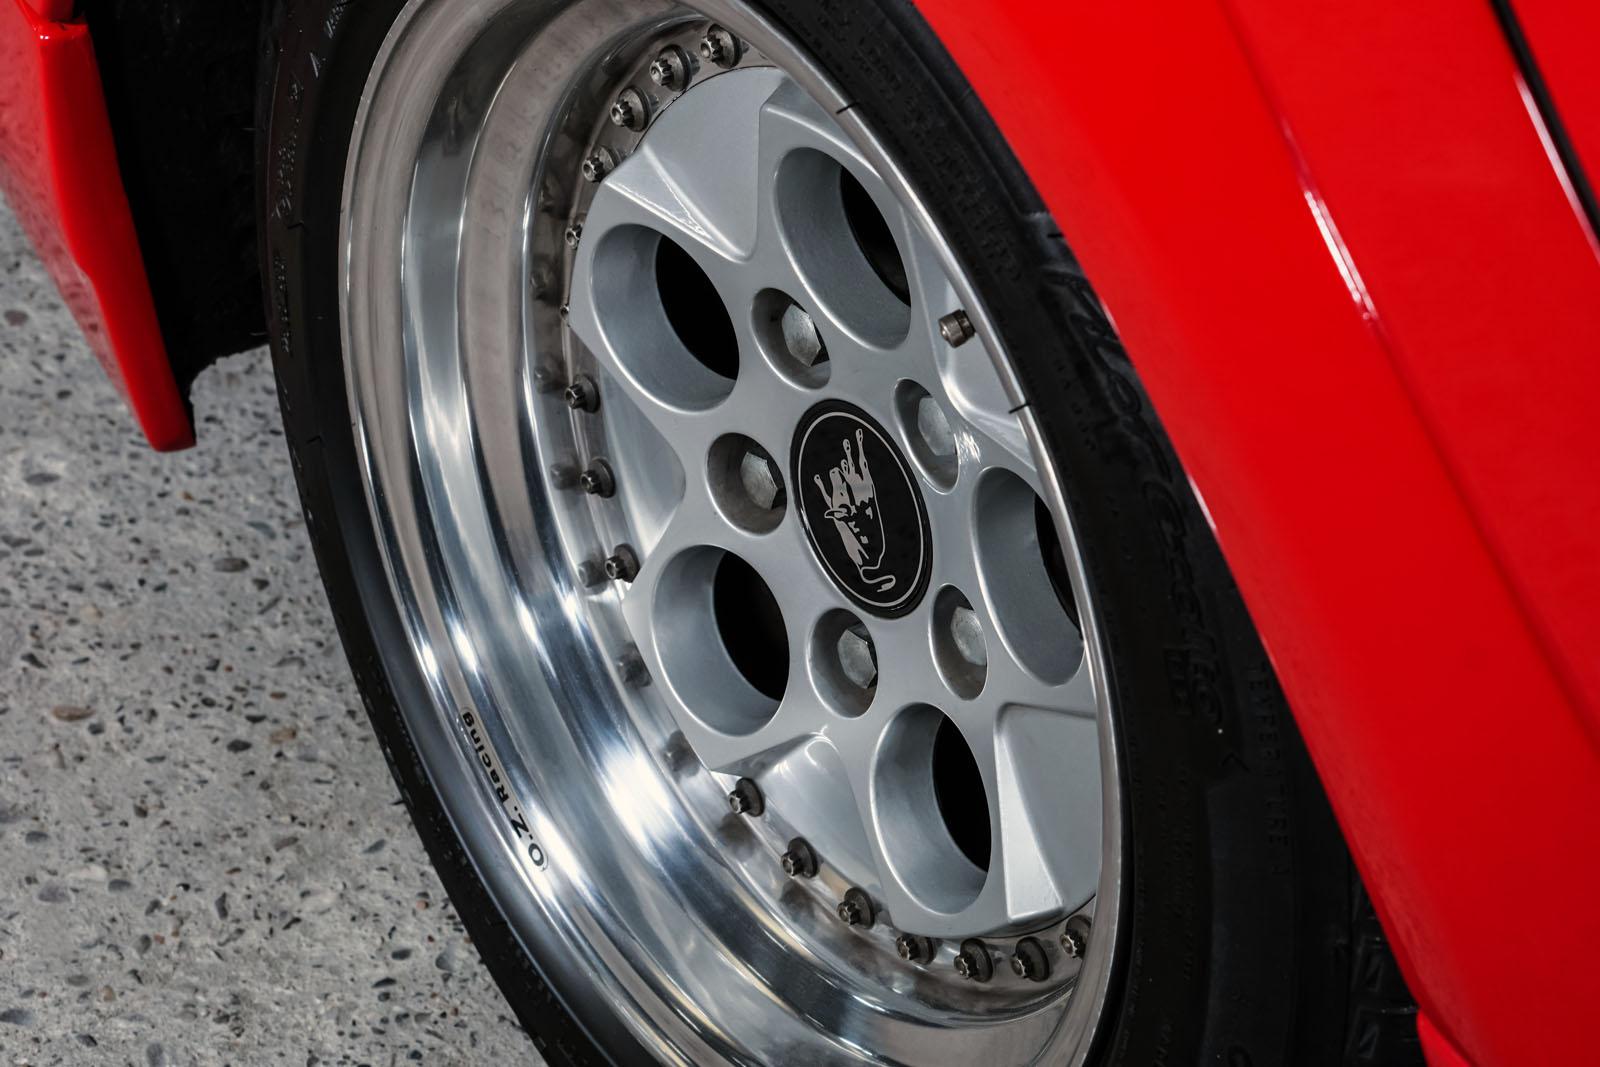 Lamborghini_Countach_Rot_Schwarz_LAM-2811_12_w